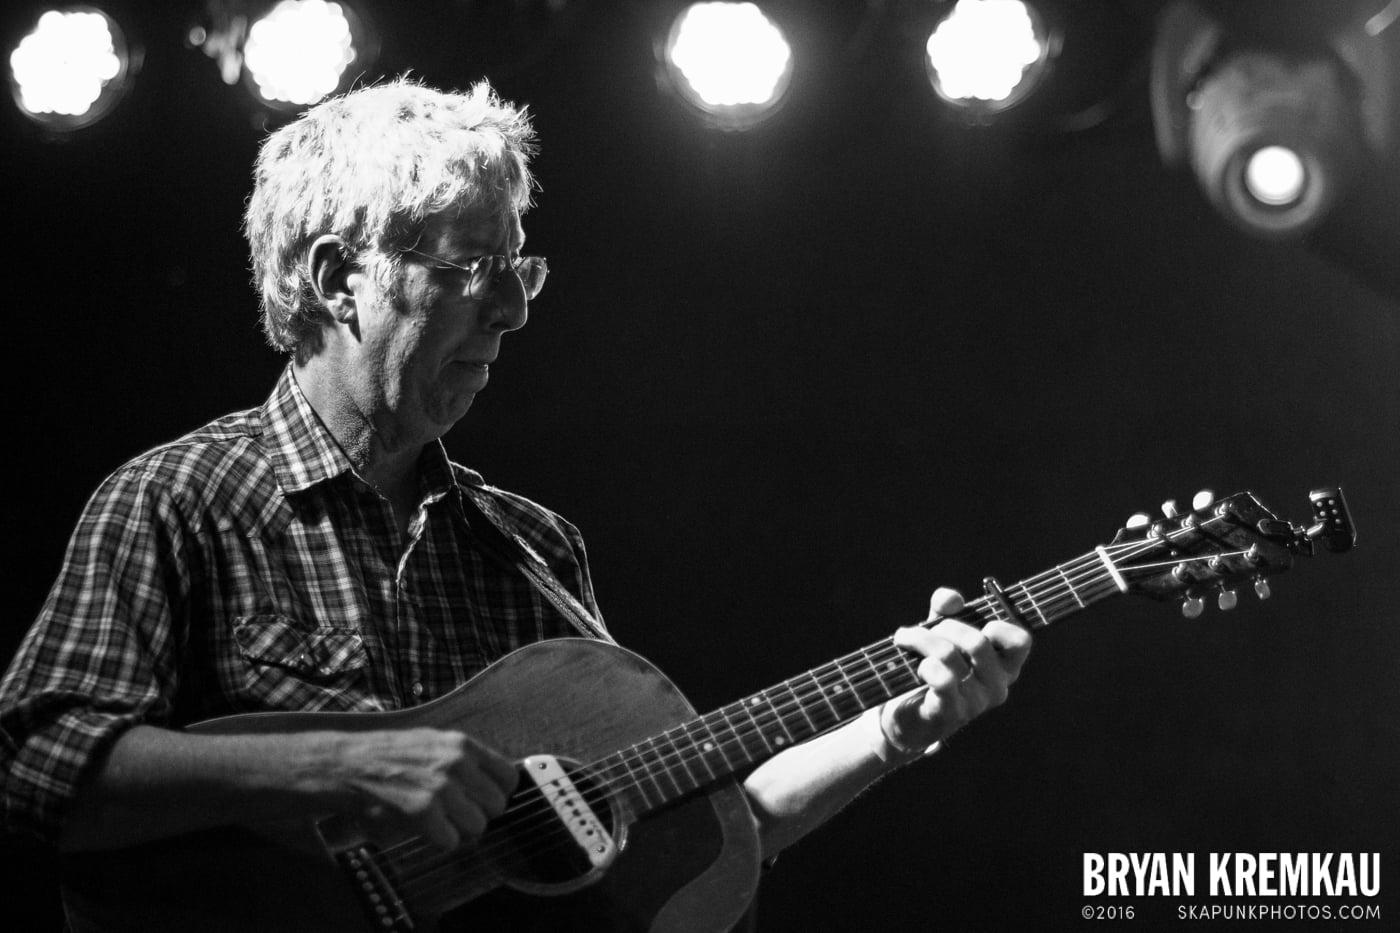 Danny Burns Band @ Knitting Factory, Brooklyn, NY - 9.10.14 (6)